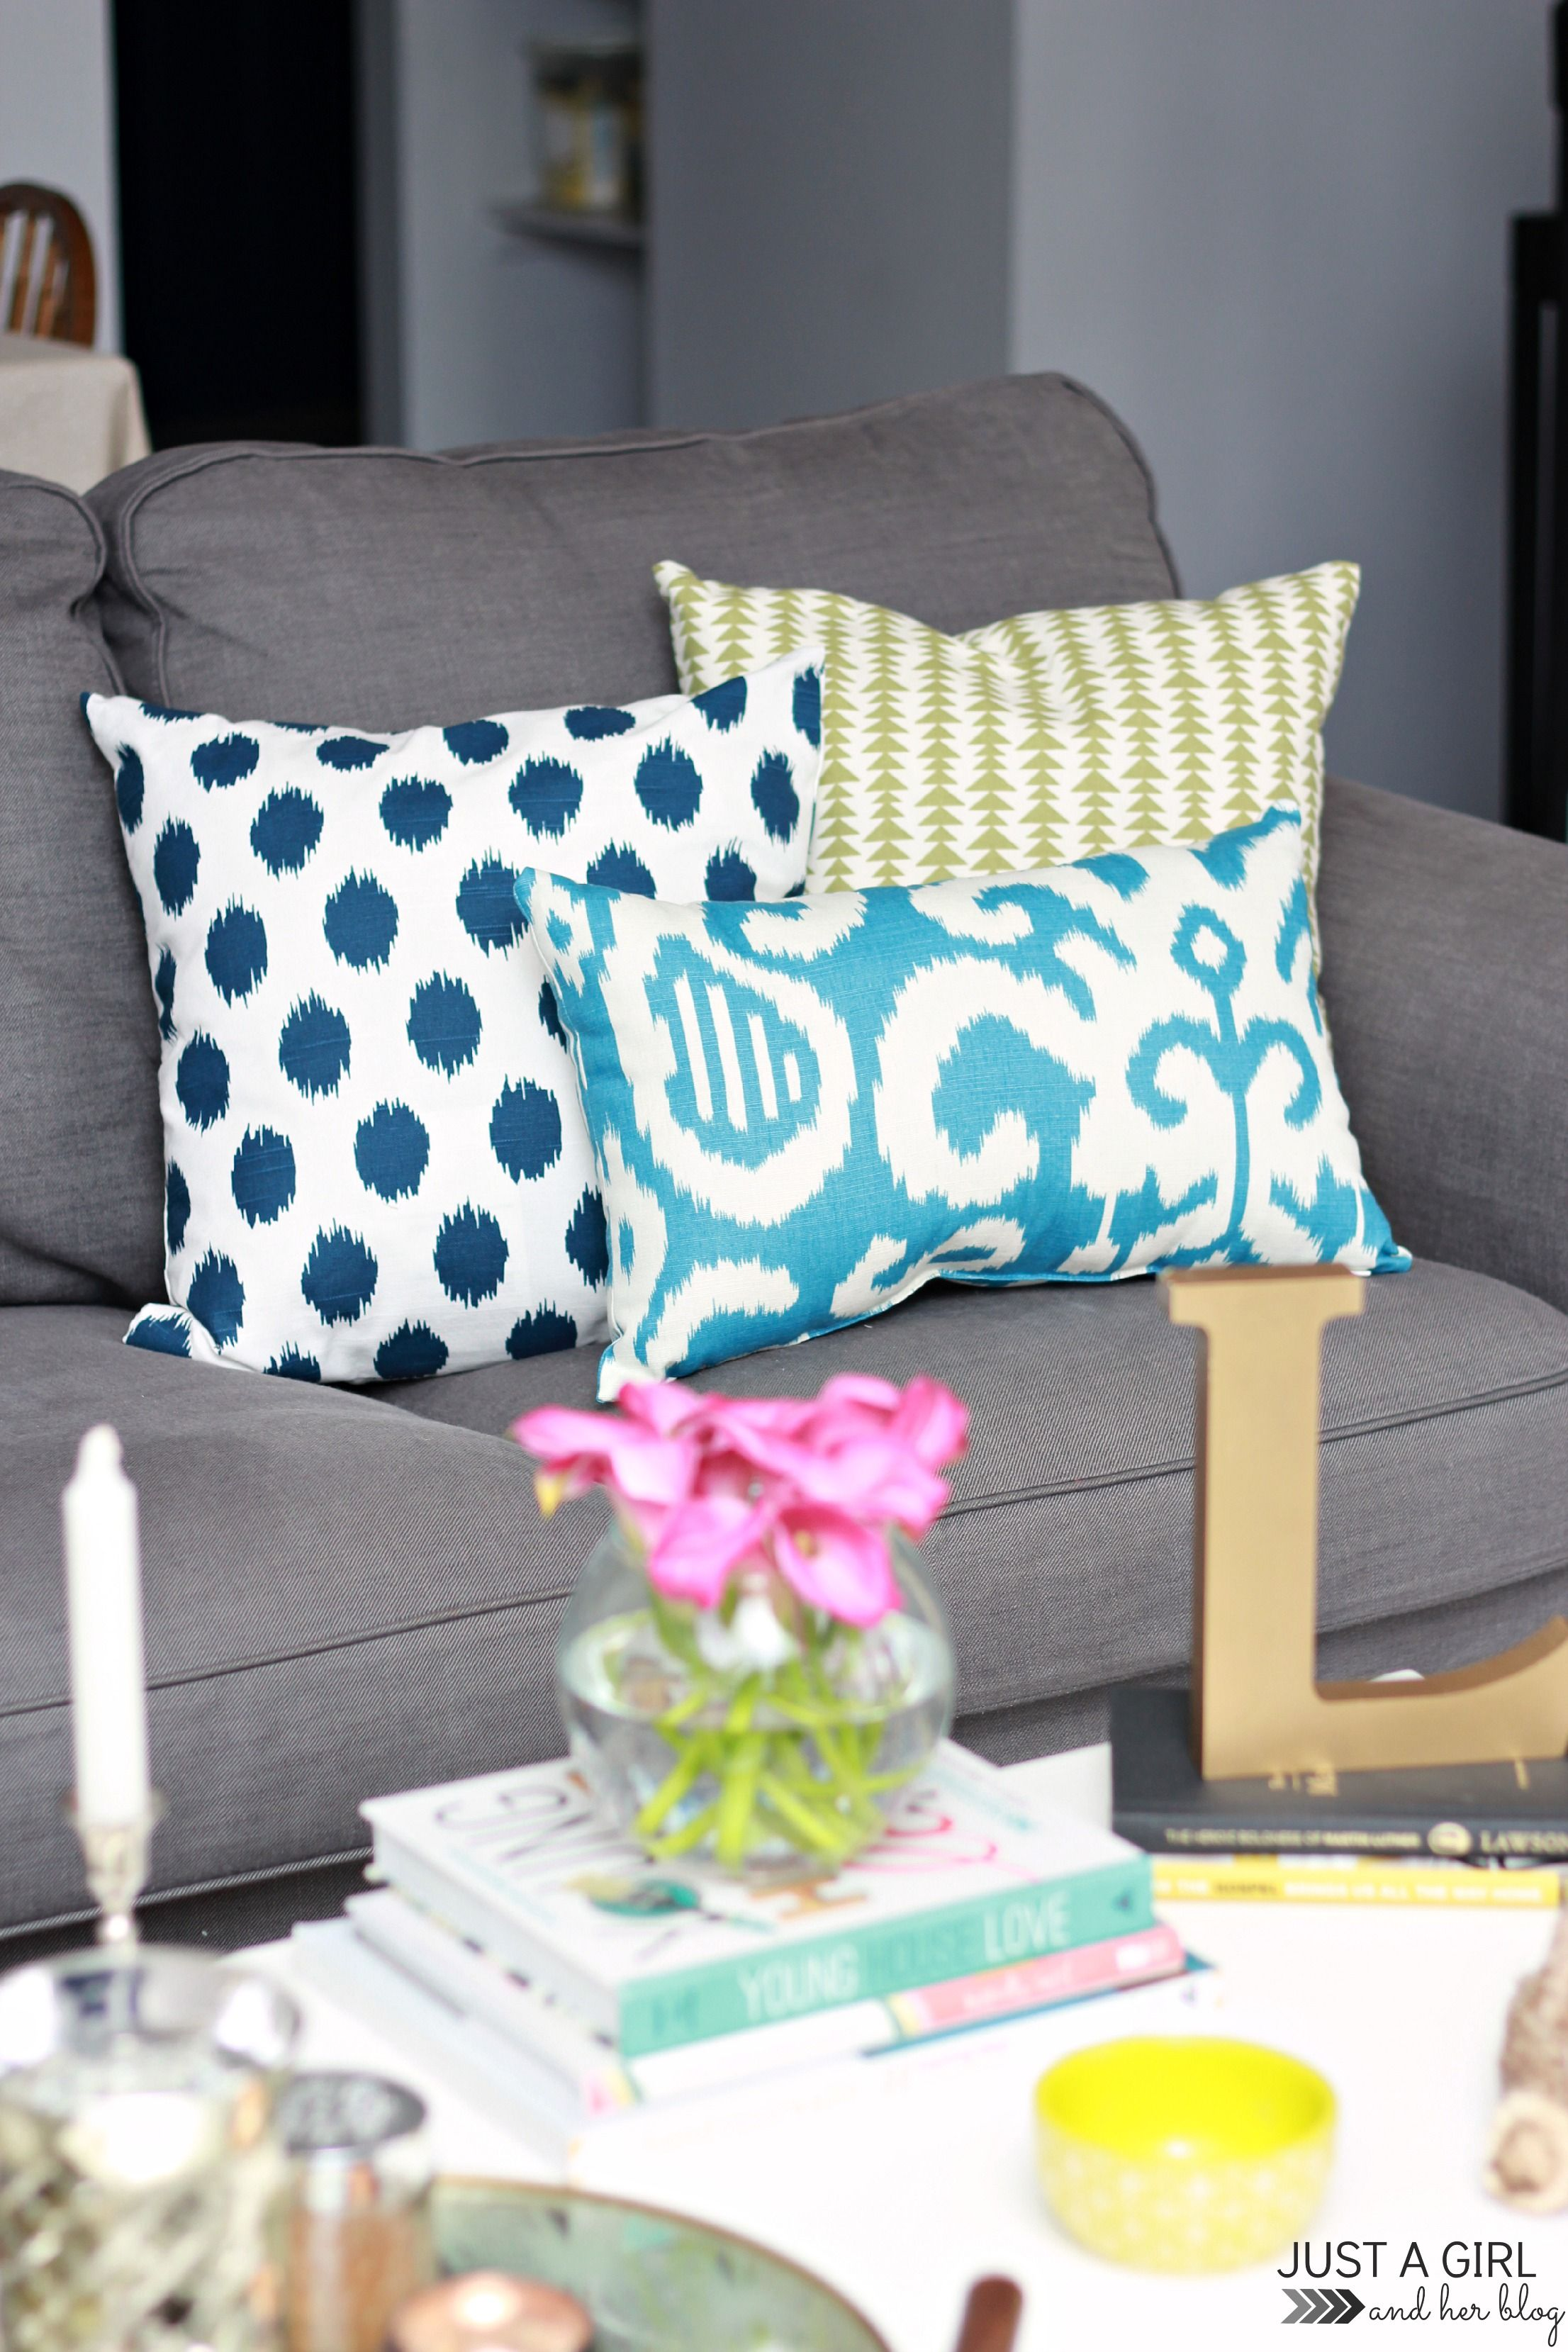 ways to mix and match throw pillows dream home ideas pinterest